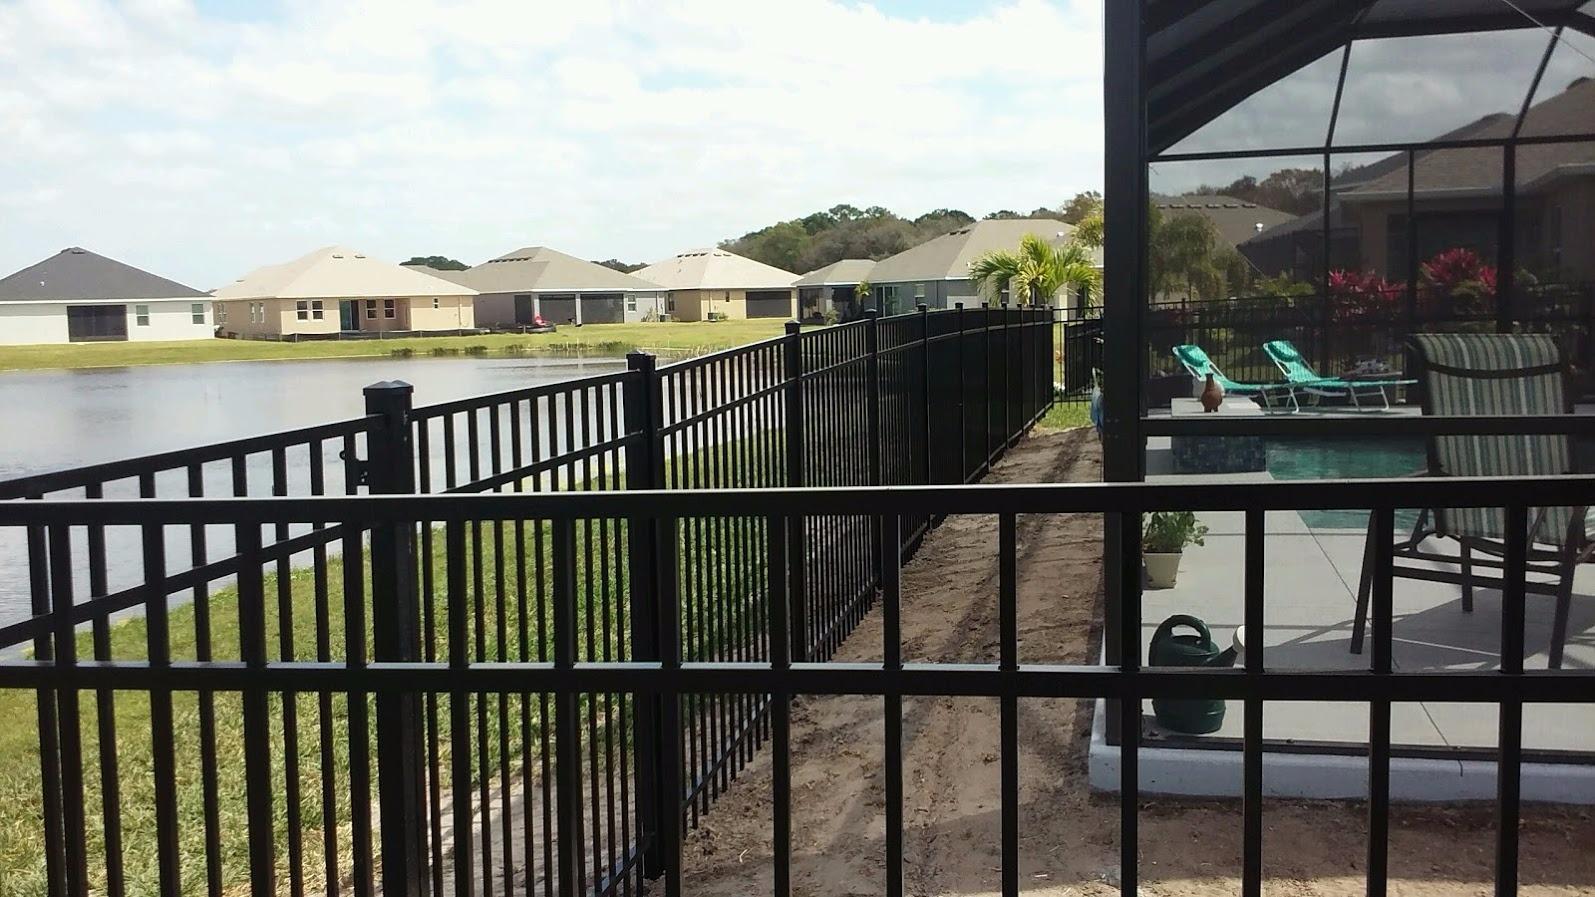 Variety Fence LLC image 3